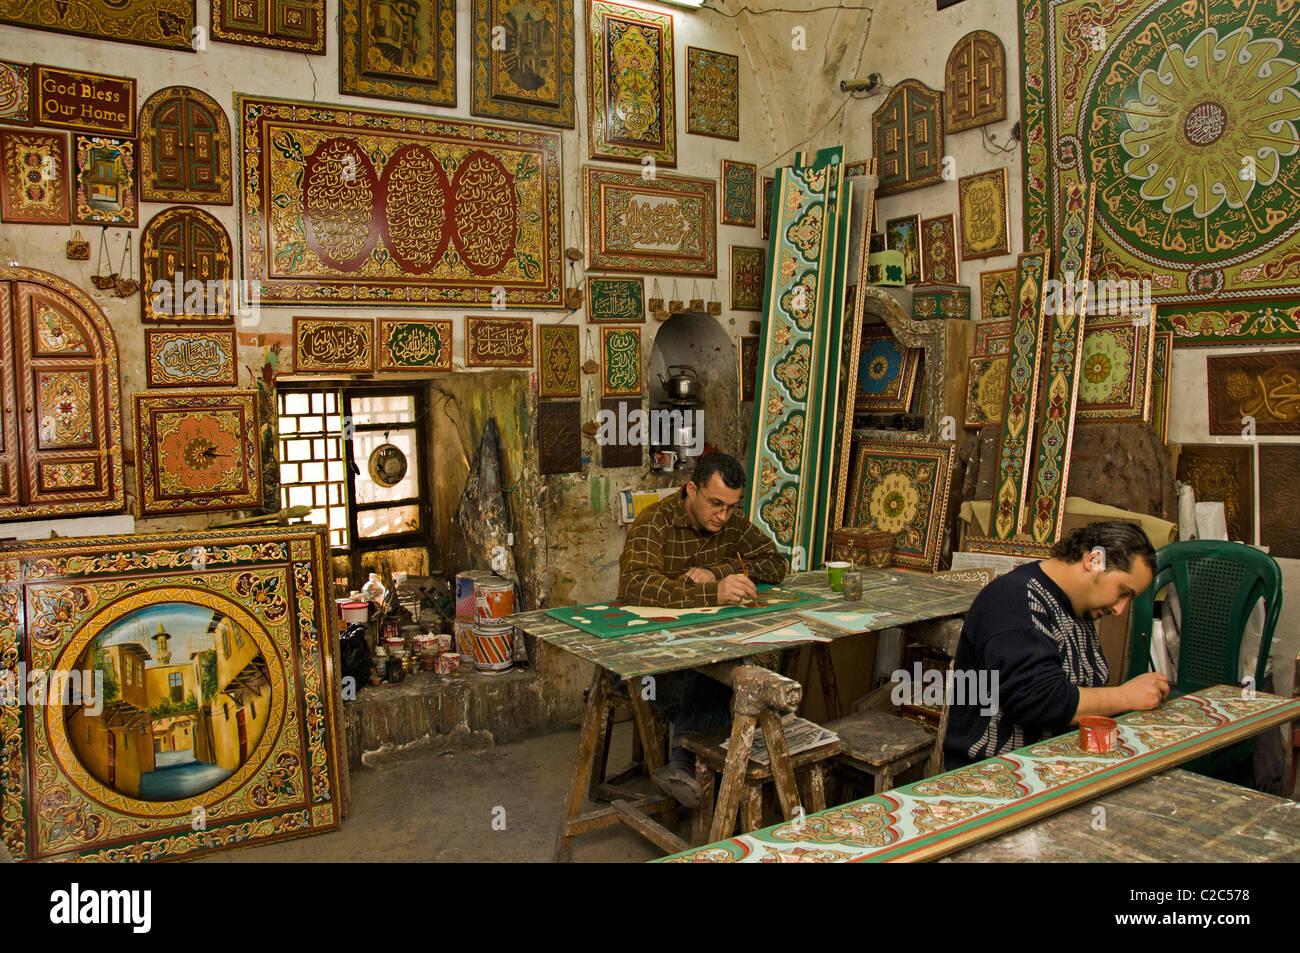 Damaskus Möbel Malen Maler Malen Syrien Basar Souk Souk Markt Shop